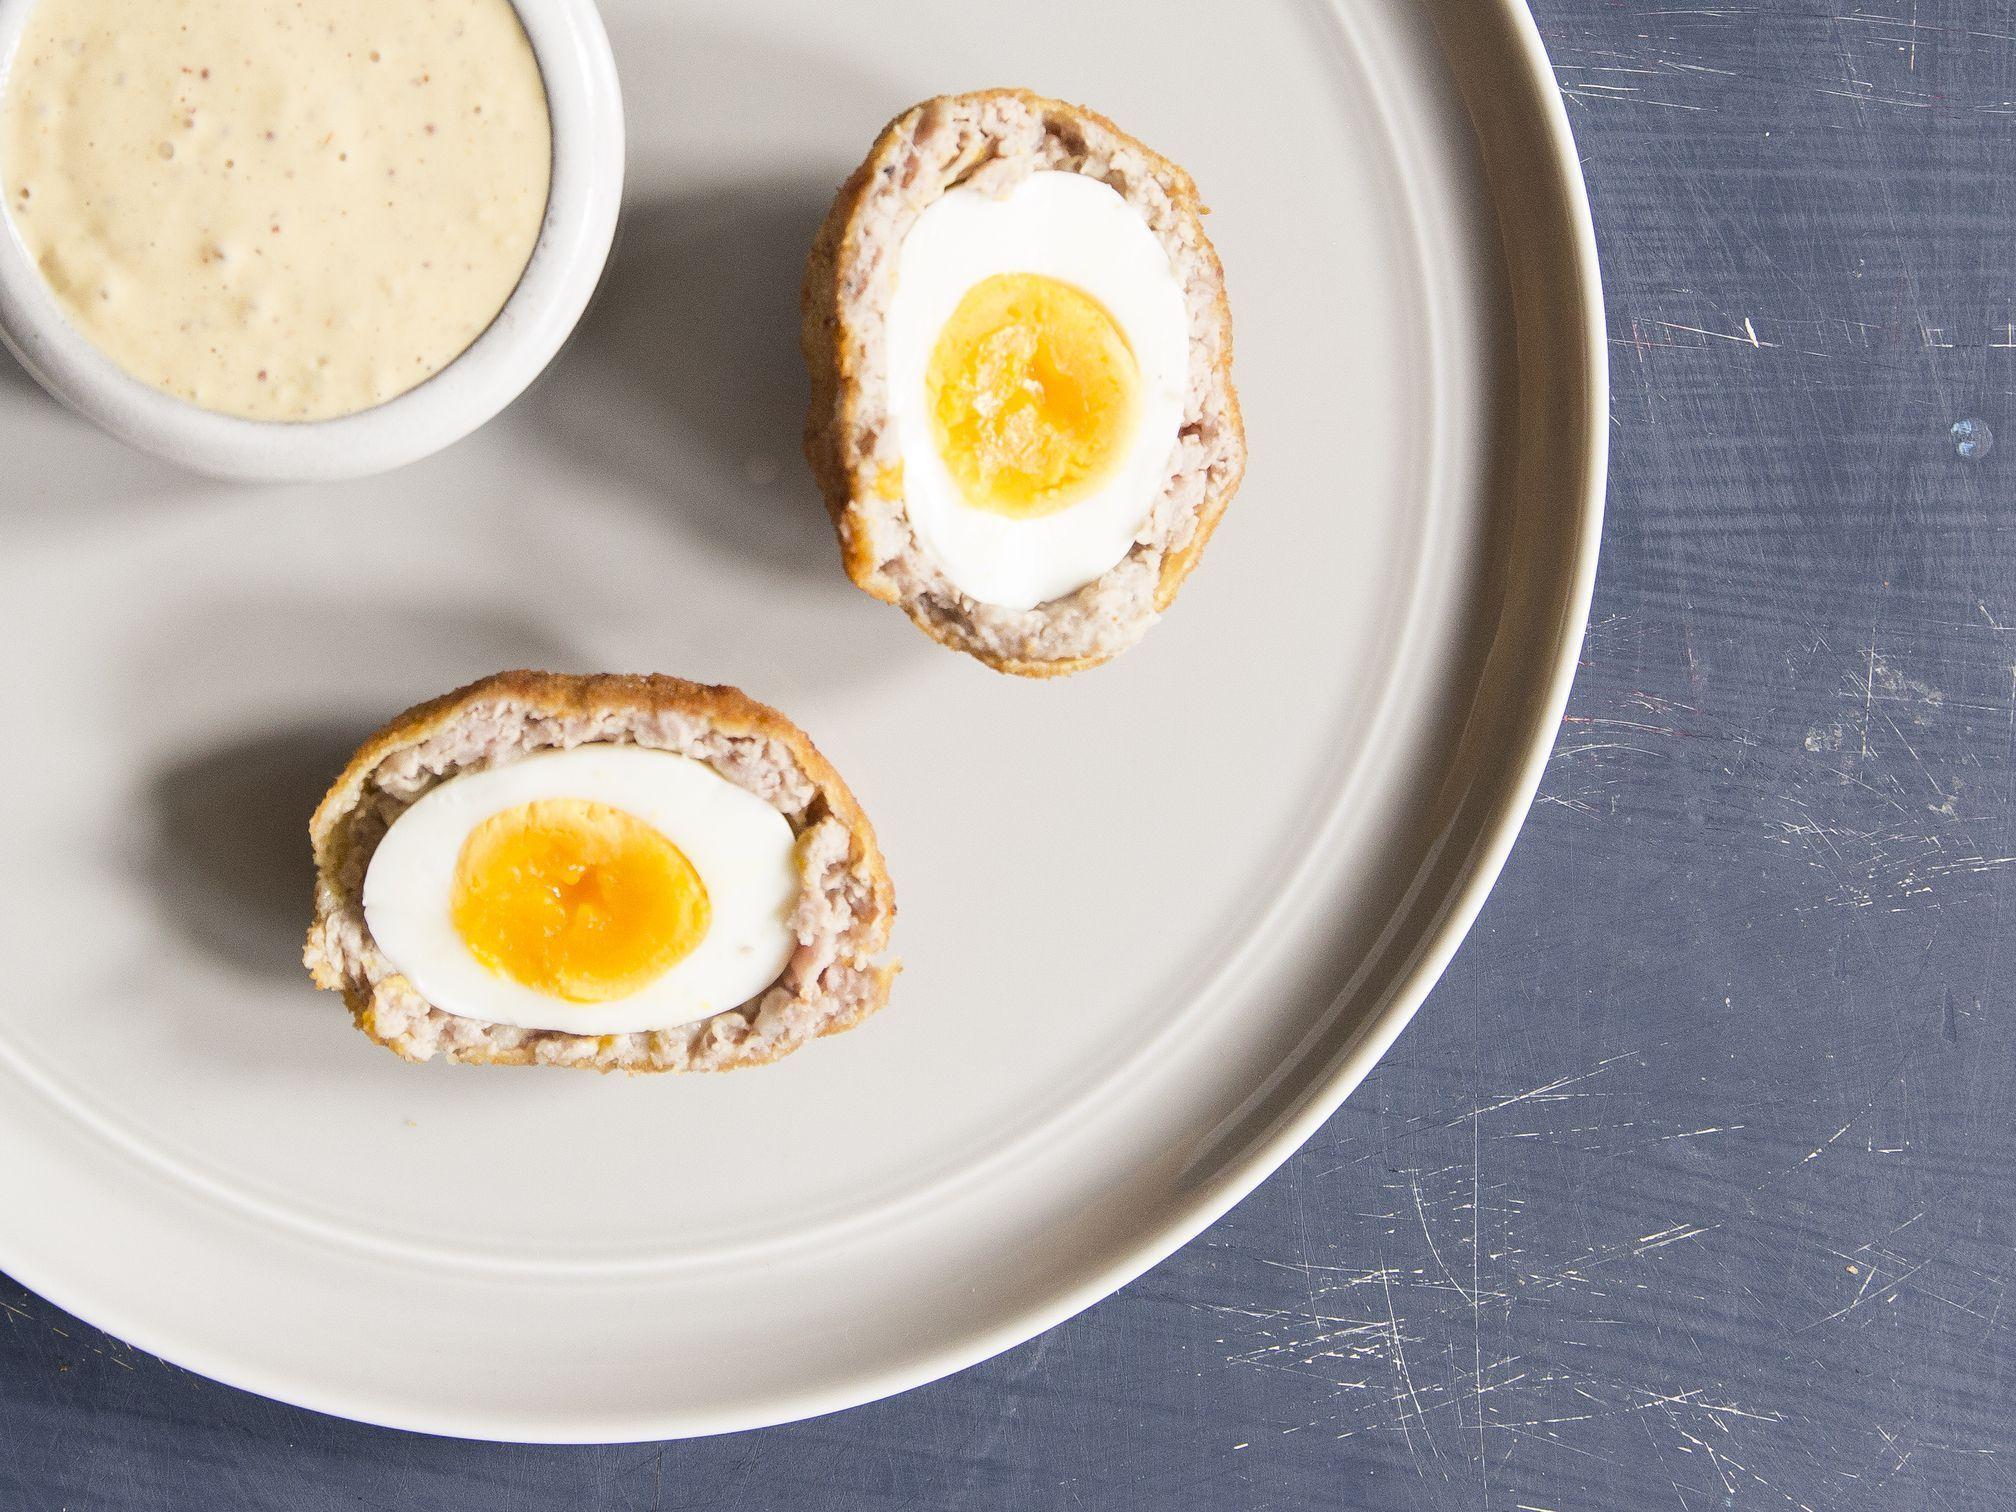 Boudin Scotch Eggs Recipe #scotcheggs Boudin Scotch Eggs Recipe | Saveur #scotcheggs Boudin Scotch Eggs Recipe #scotcheggs Boudin Scotch Eggs Recipe | Saveur #scotcheggs